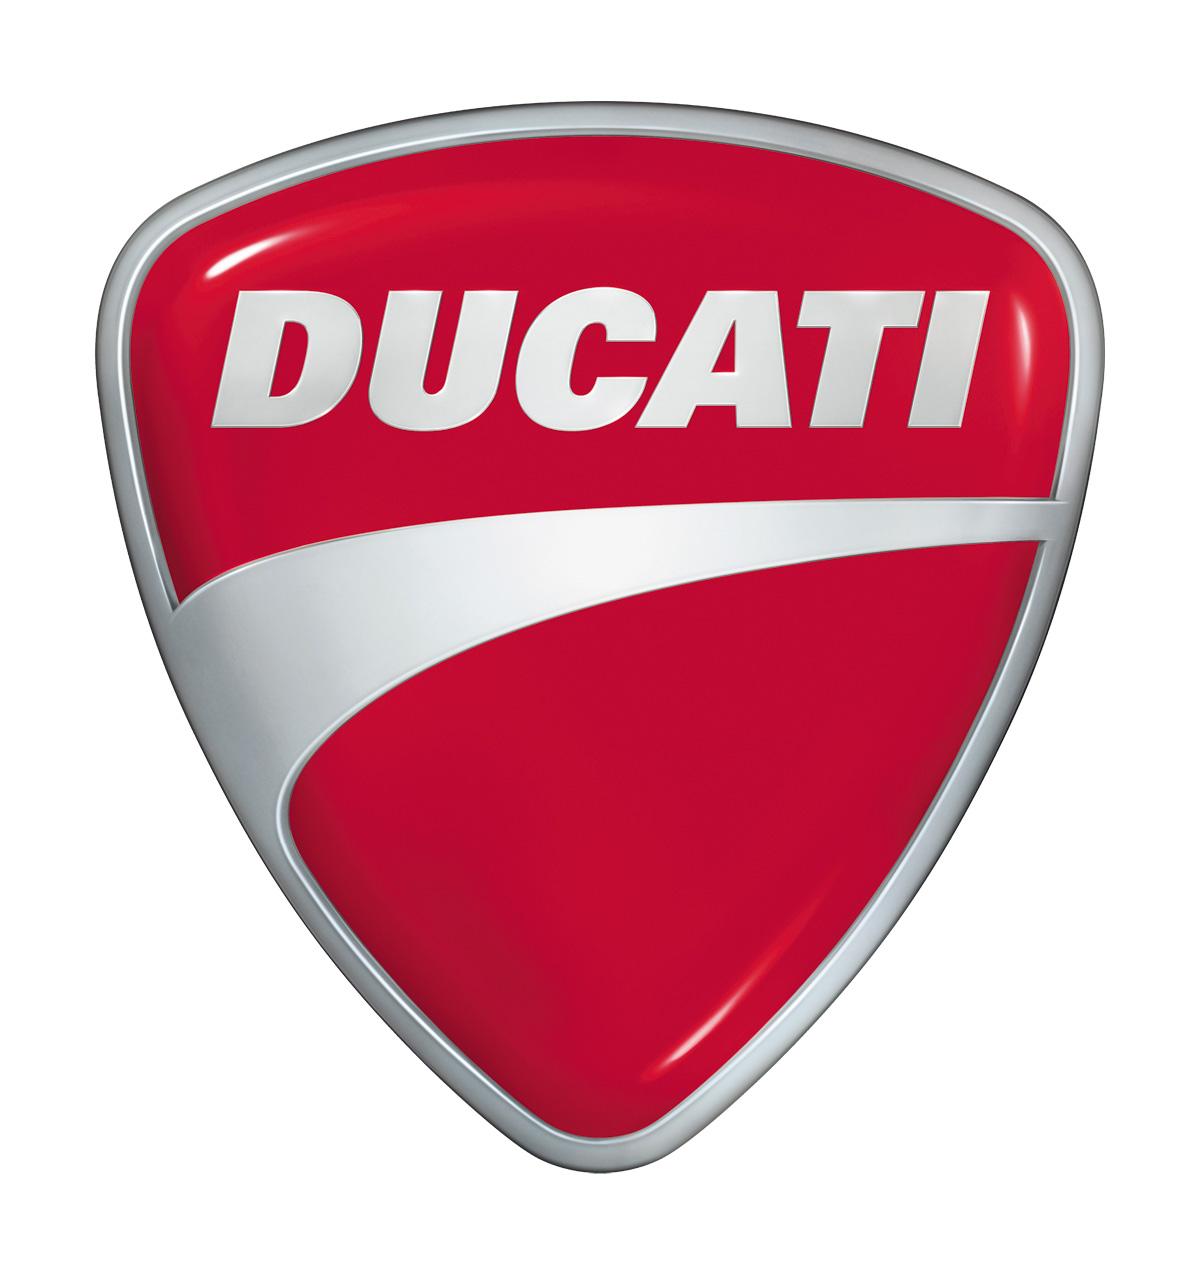 Ducati Logo Wallpaper 7328 Hd Wallpapers in Logos   Imagescicom 1200x1274